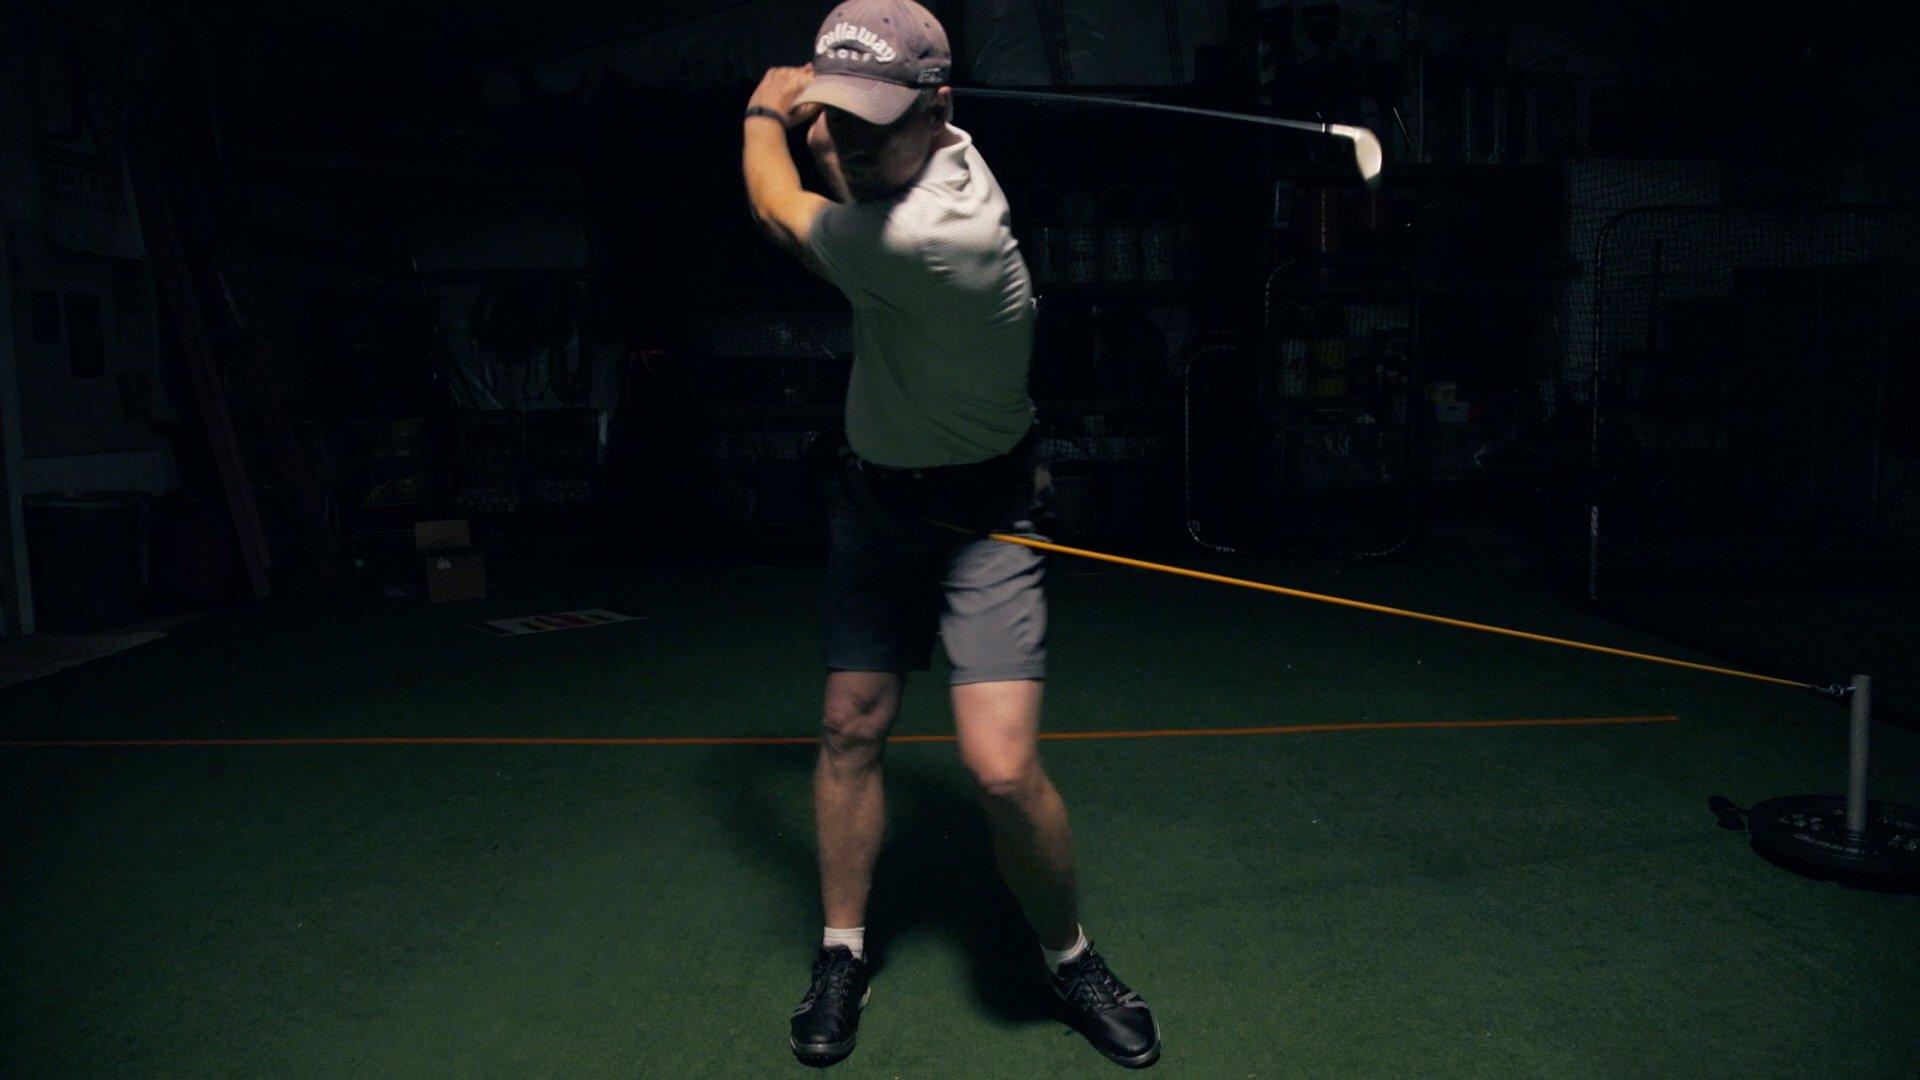 Powercore 360 Golf Full Body Training System (XS/S) by Powercore 360